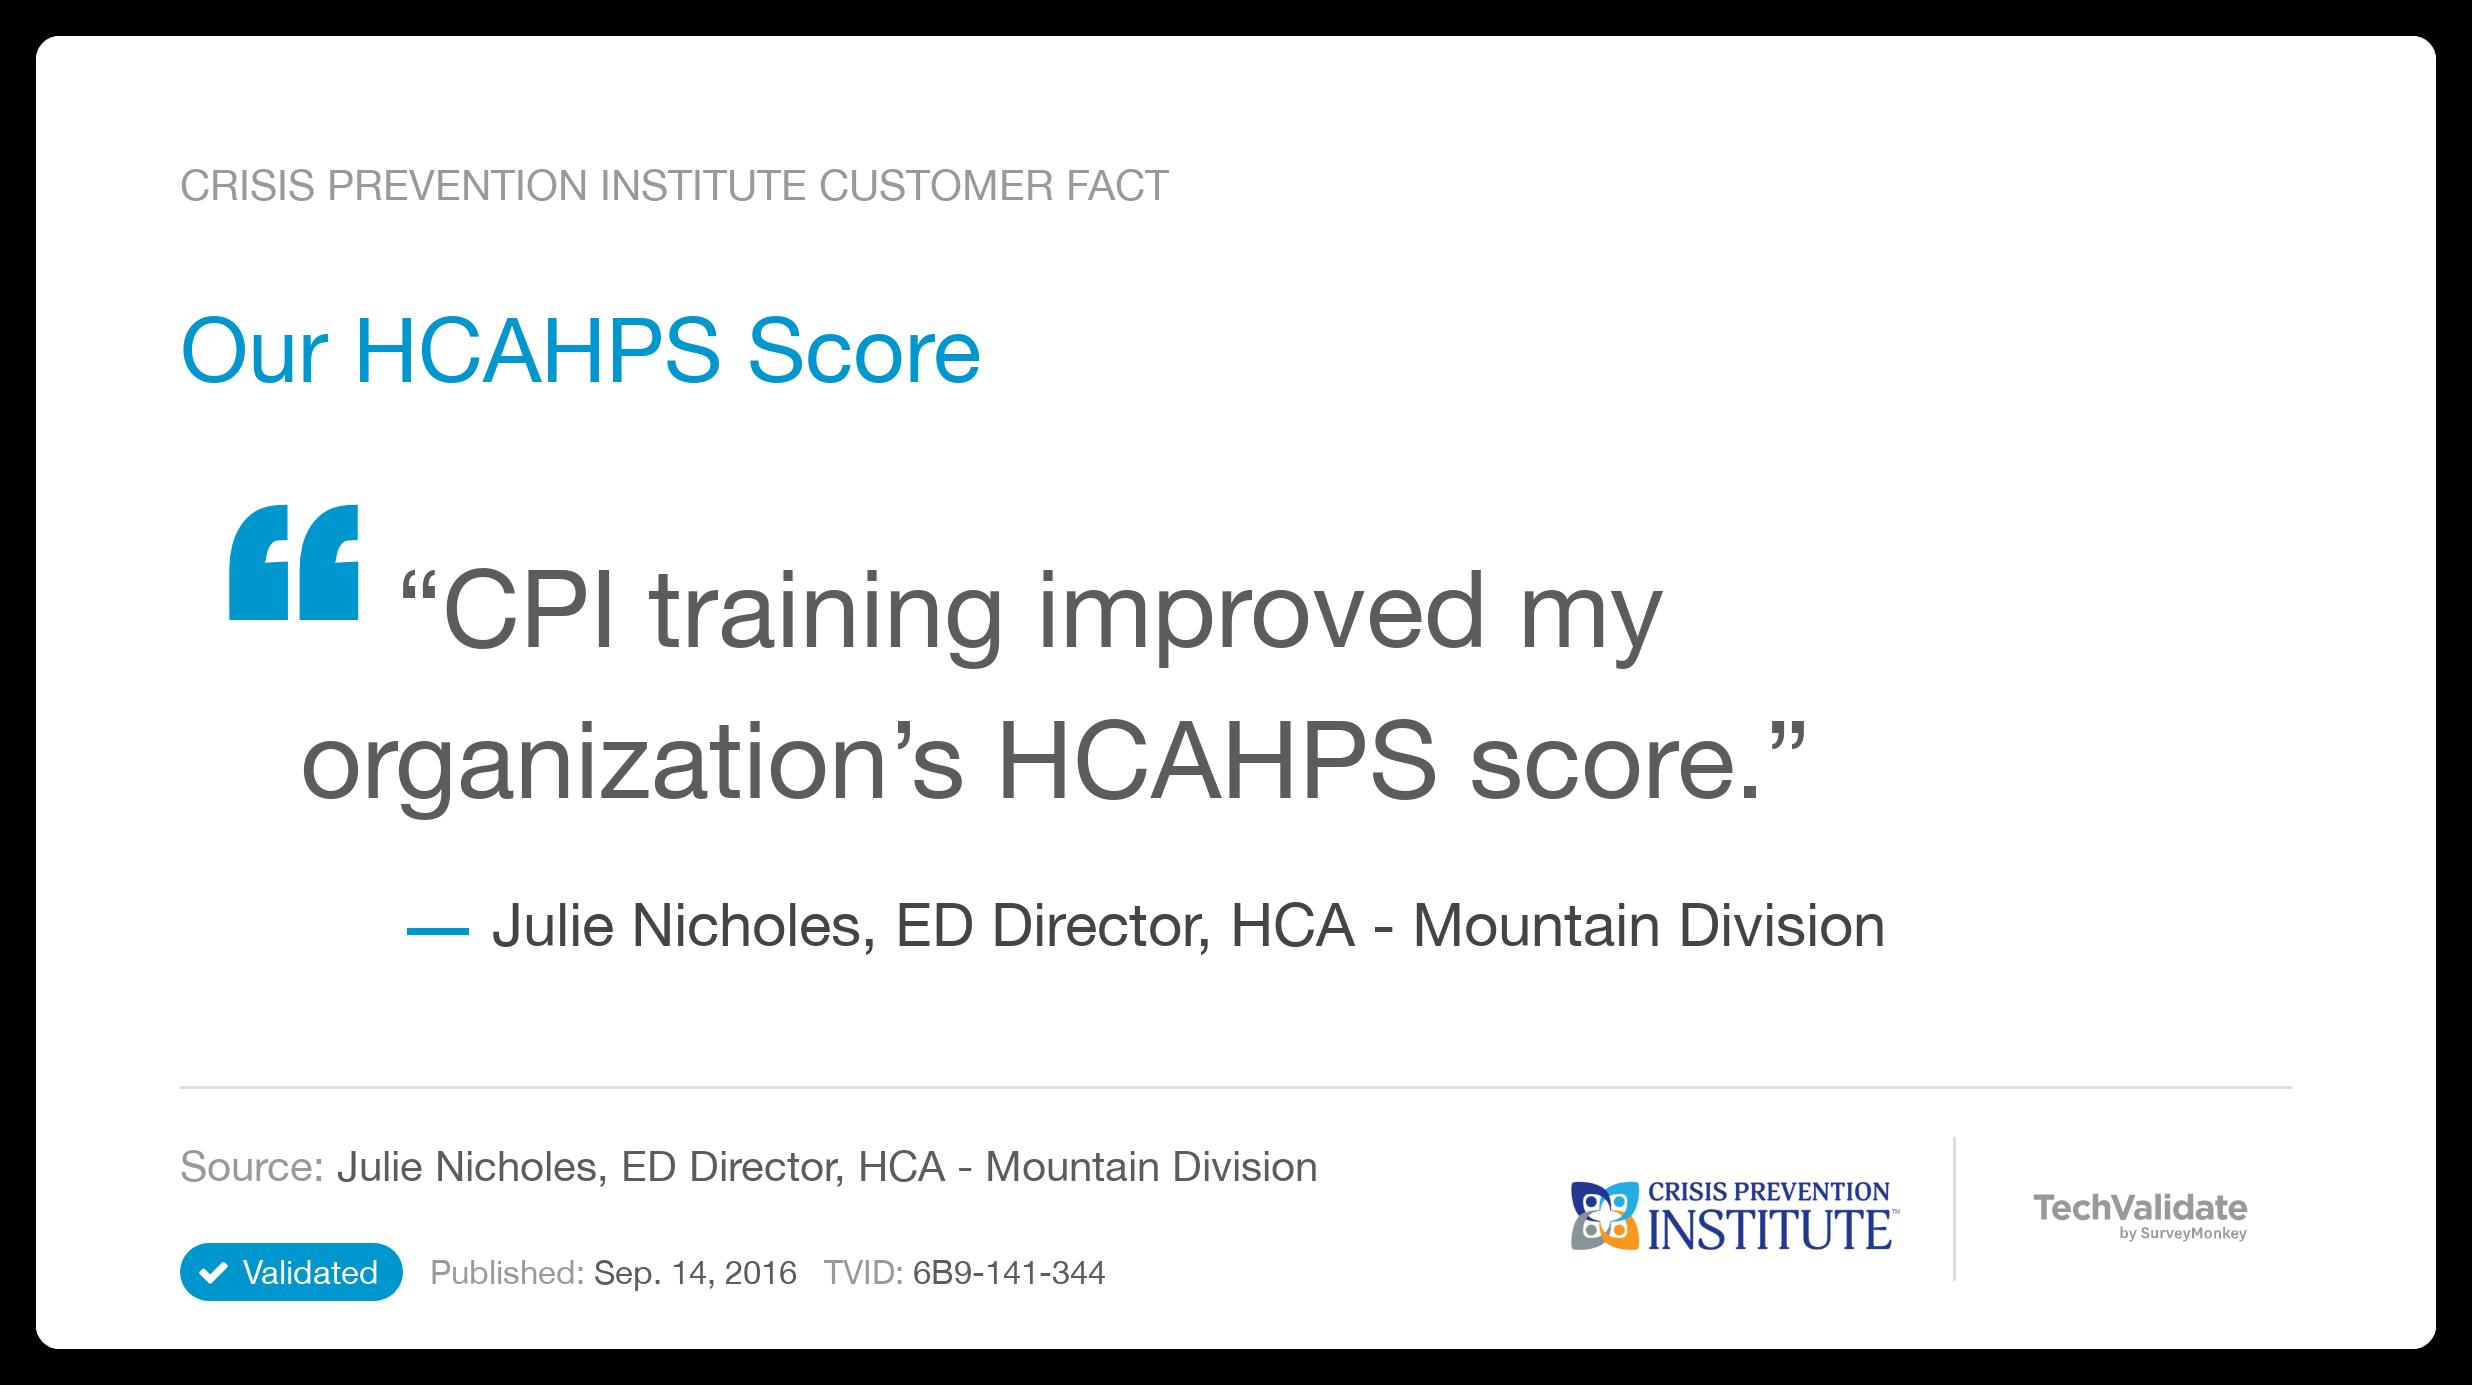 Crisis Prevention Institute TechFact: Our HCAHPS Score